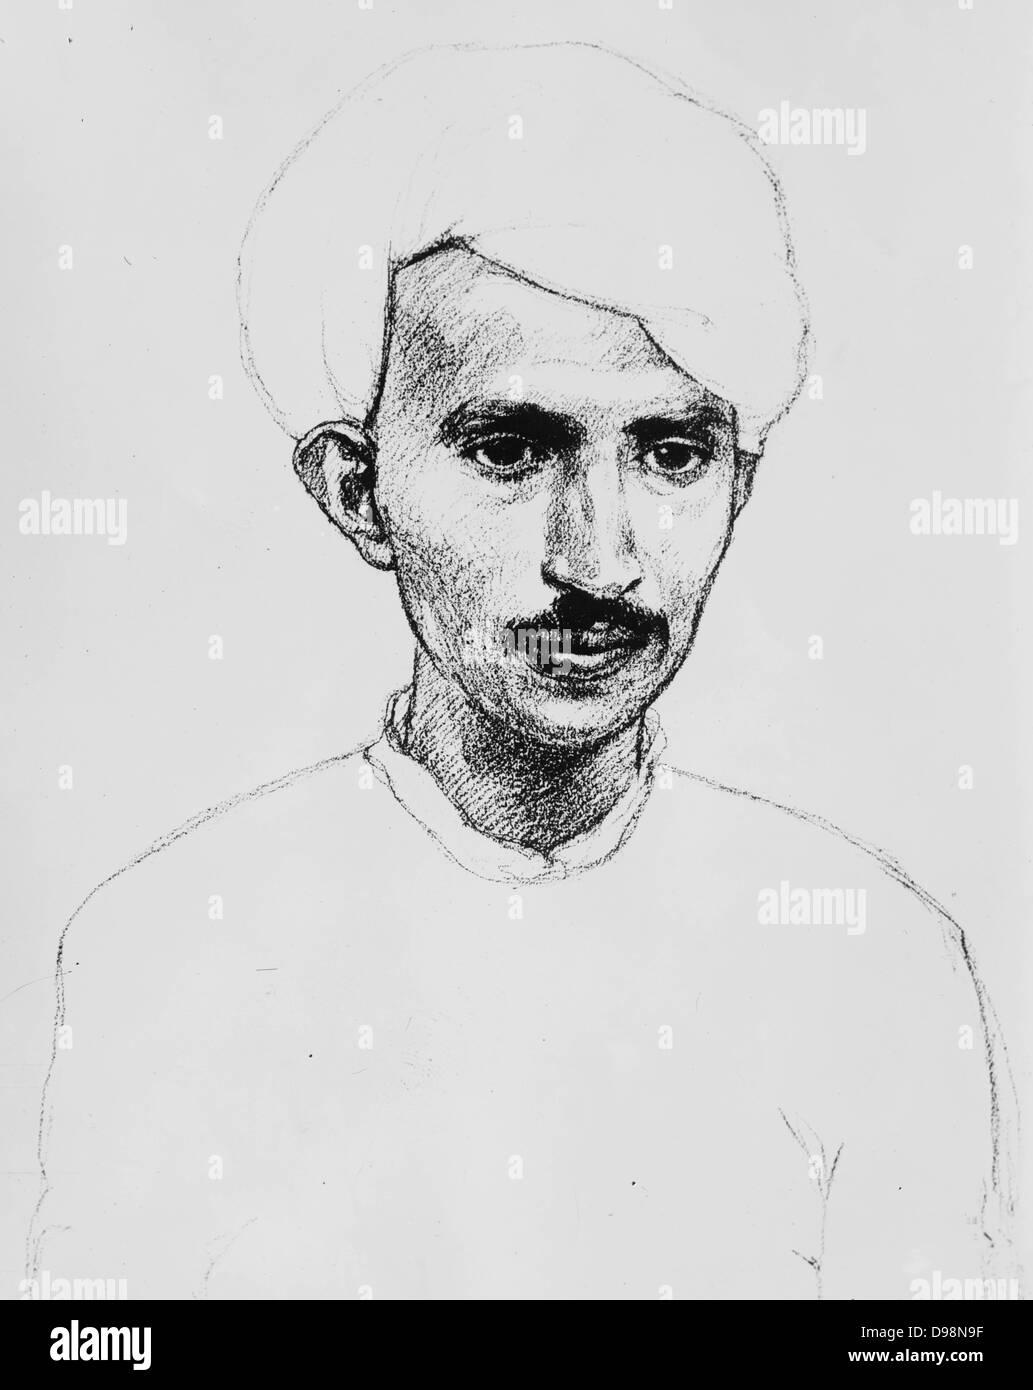 Drawing of Mahattma Gandhi by William Pogany ( 1882 – 1955) Hungarian illustrator - Stock Image